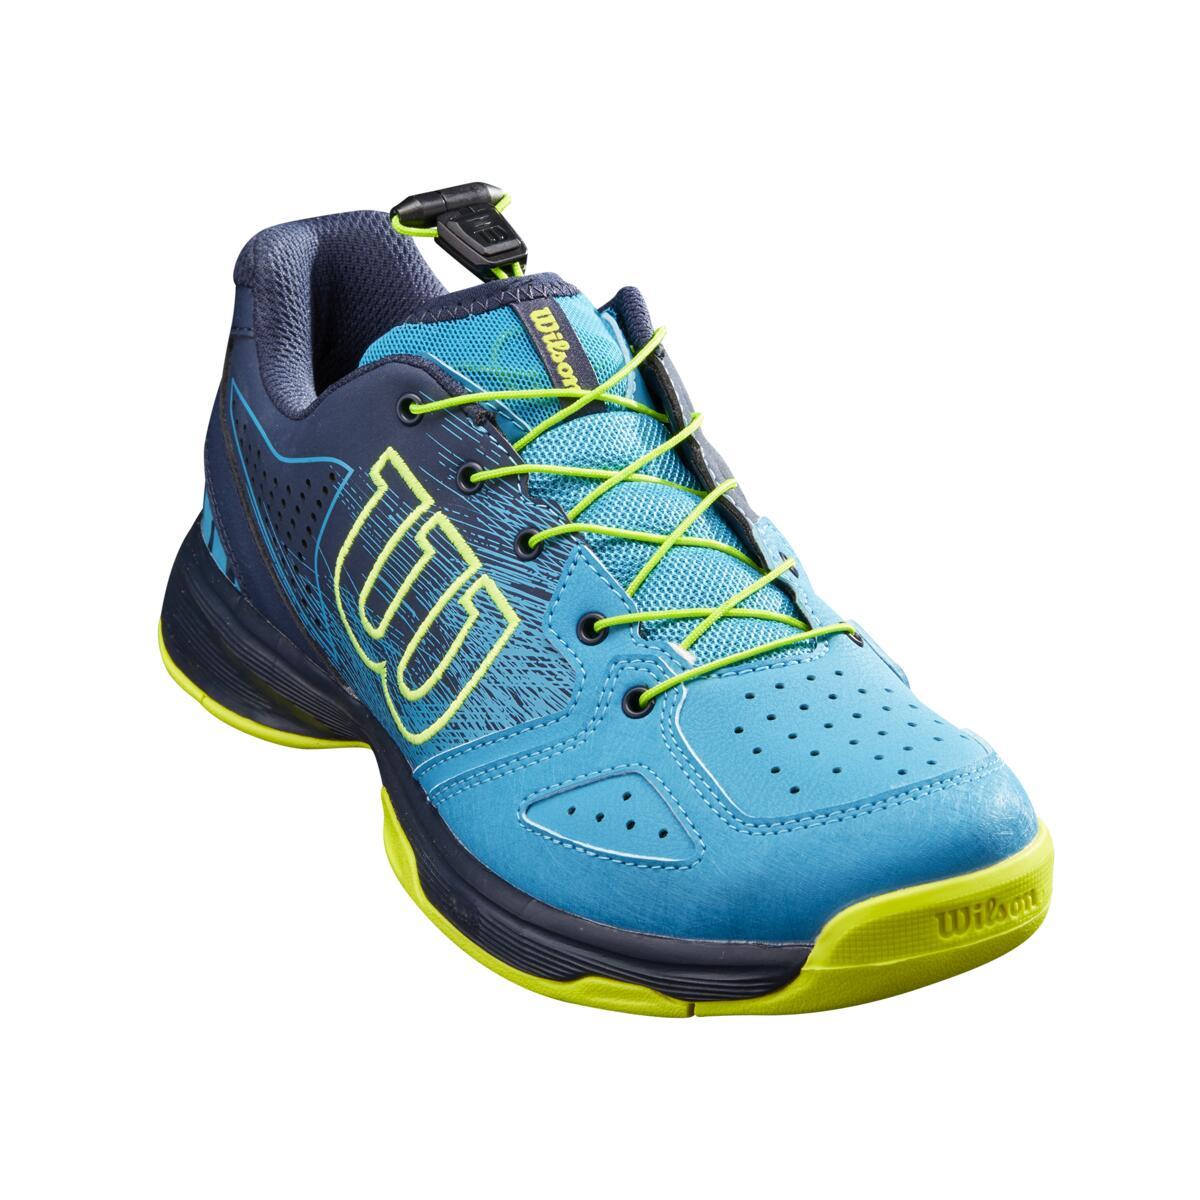 Wilson Kaos QL Junior Tennis Shoe – Barrier Reef/Navy Blazer/Lime Popsicle